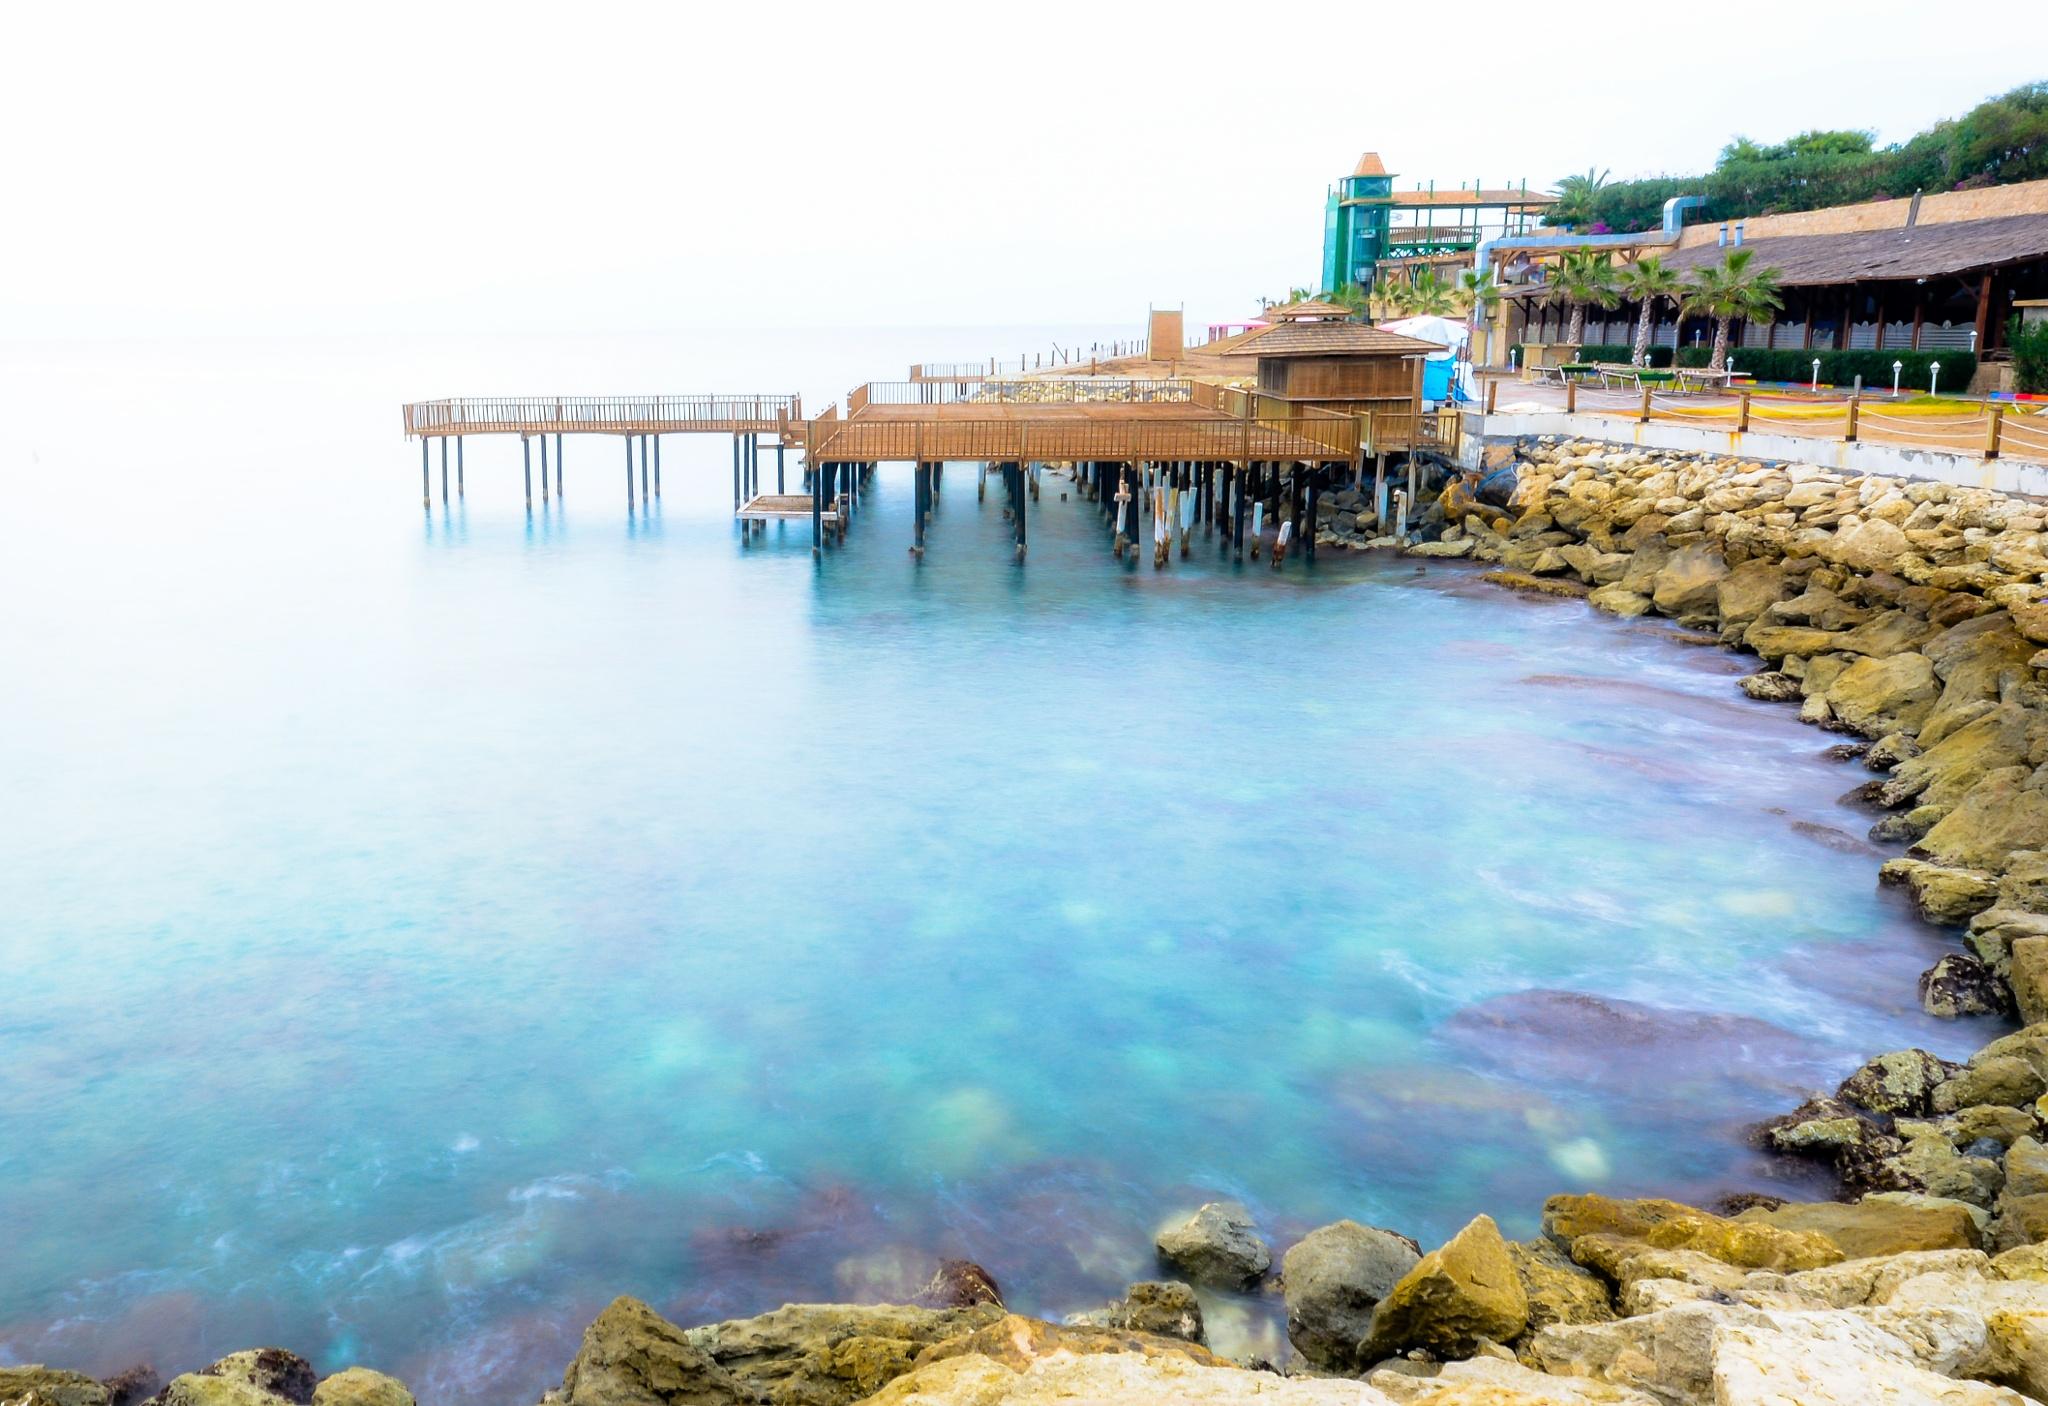 Deep in blue by baybora